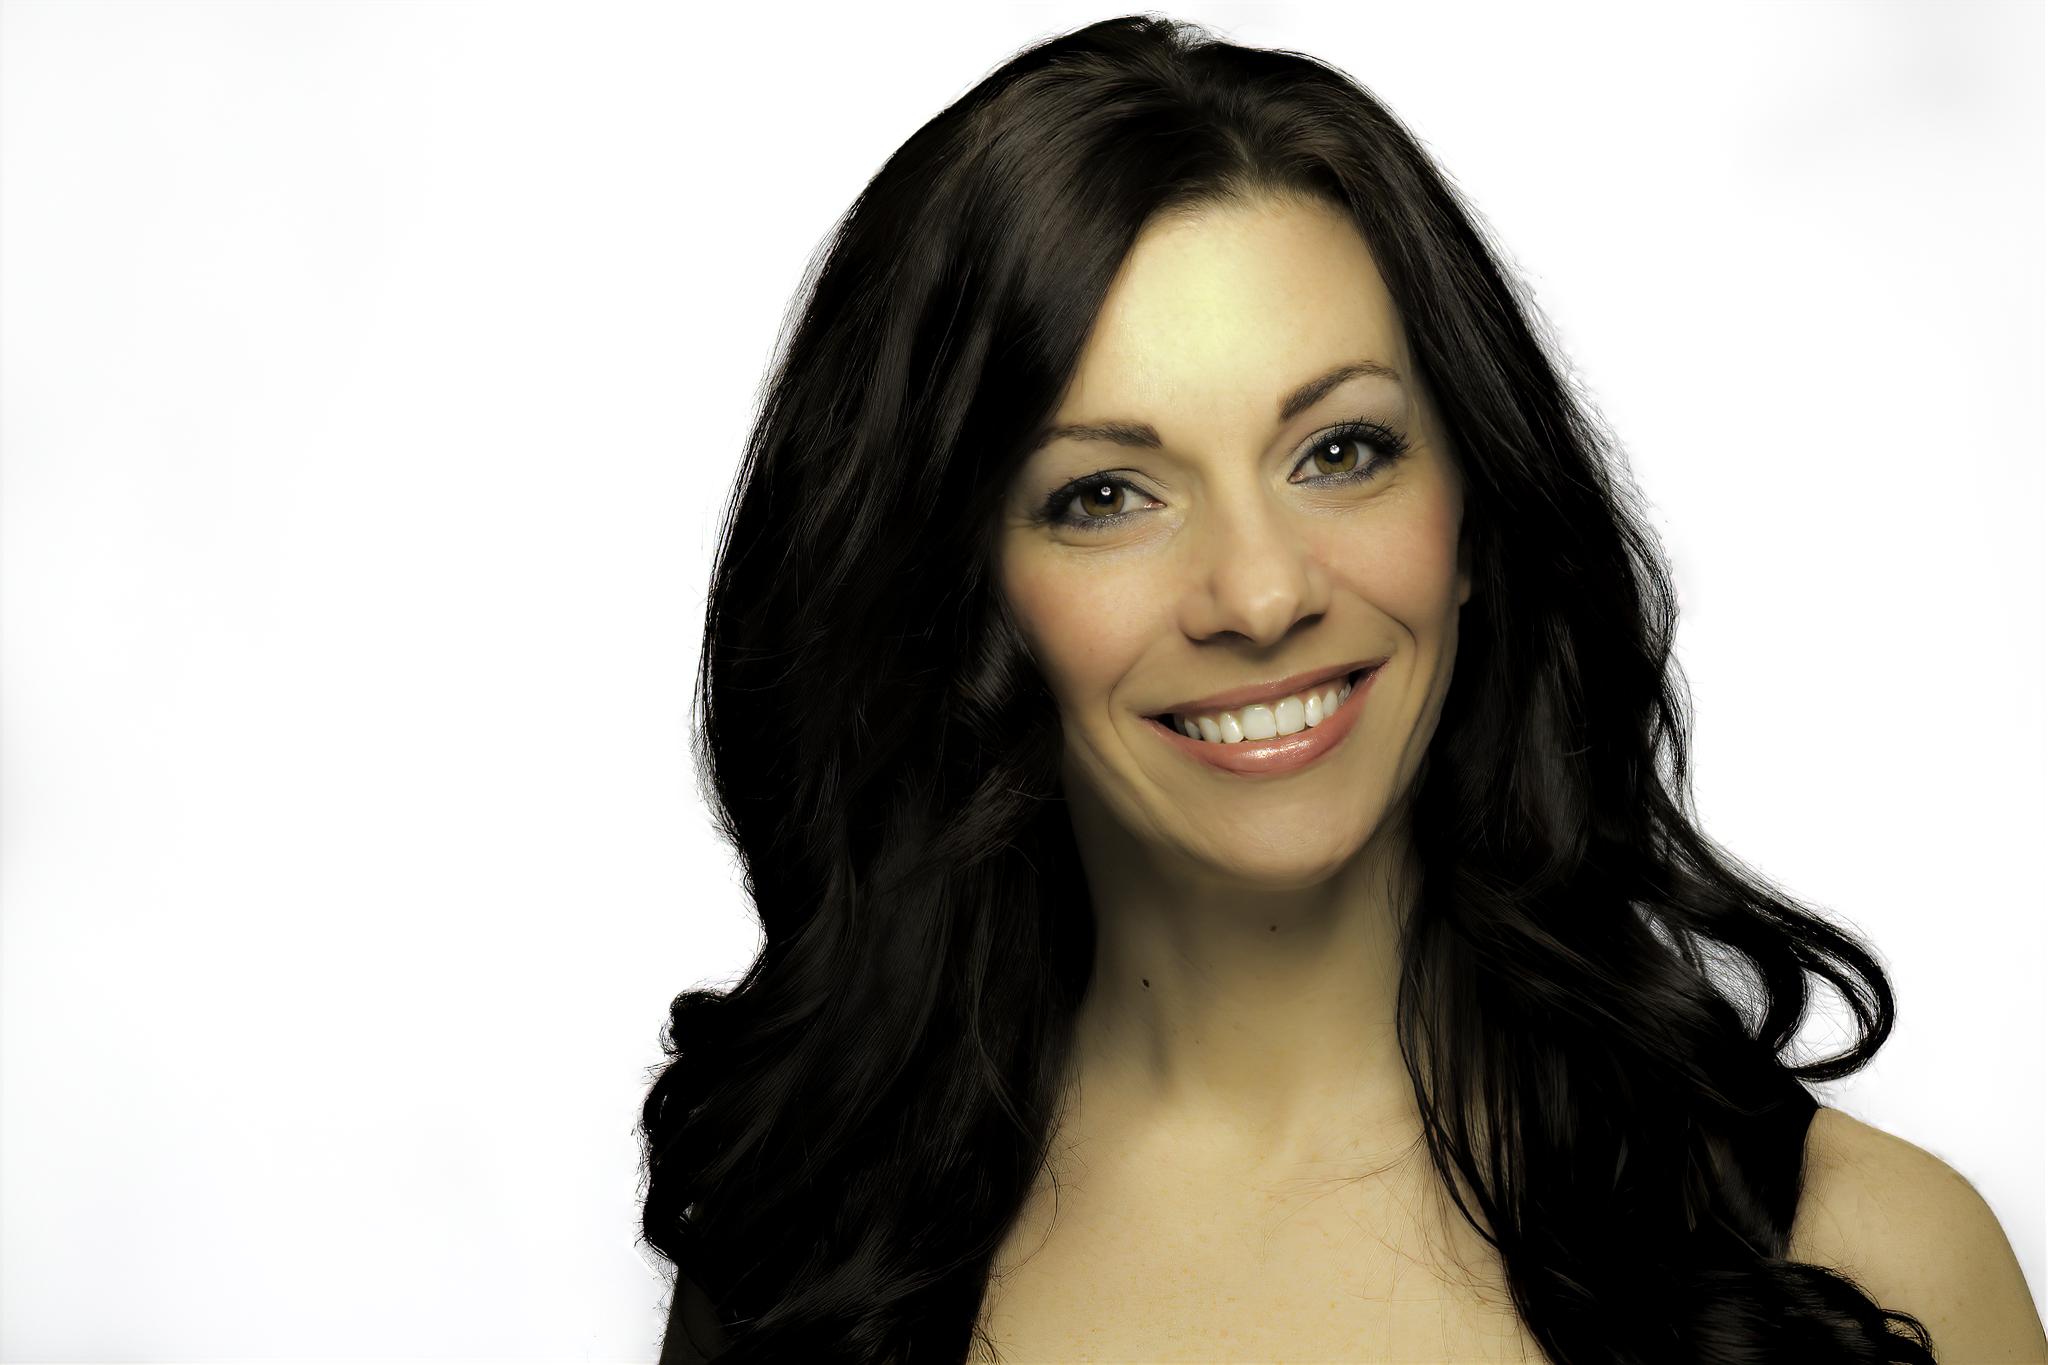 Christy Headshot 2-sharpen-focus.png